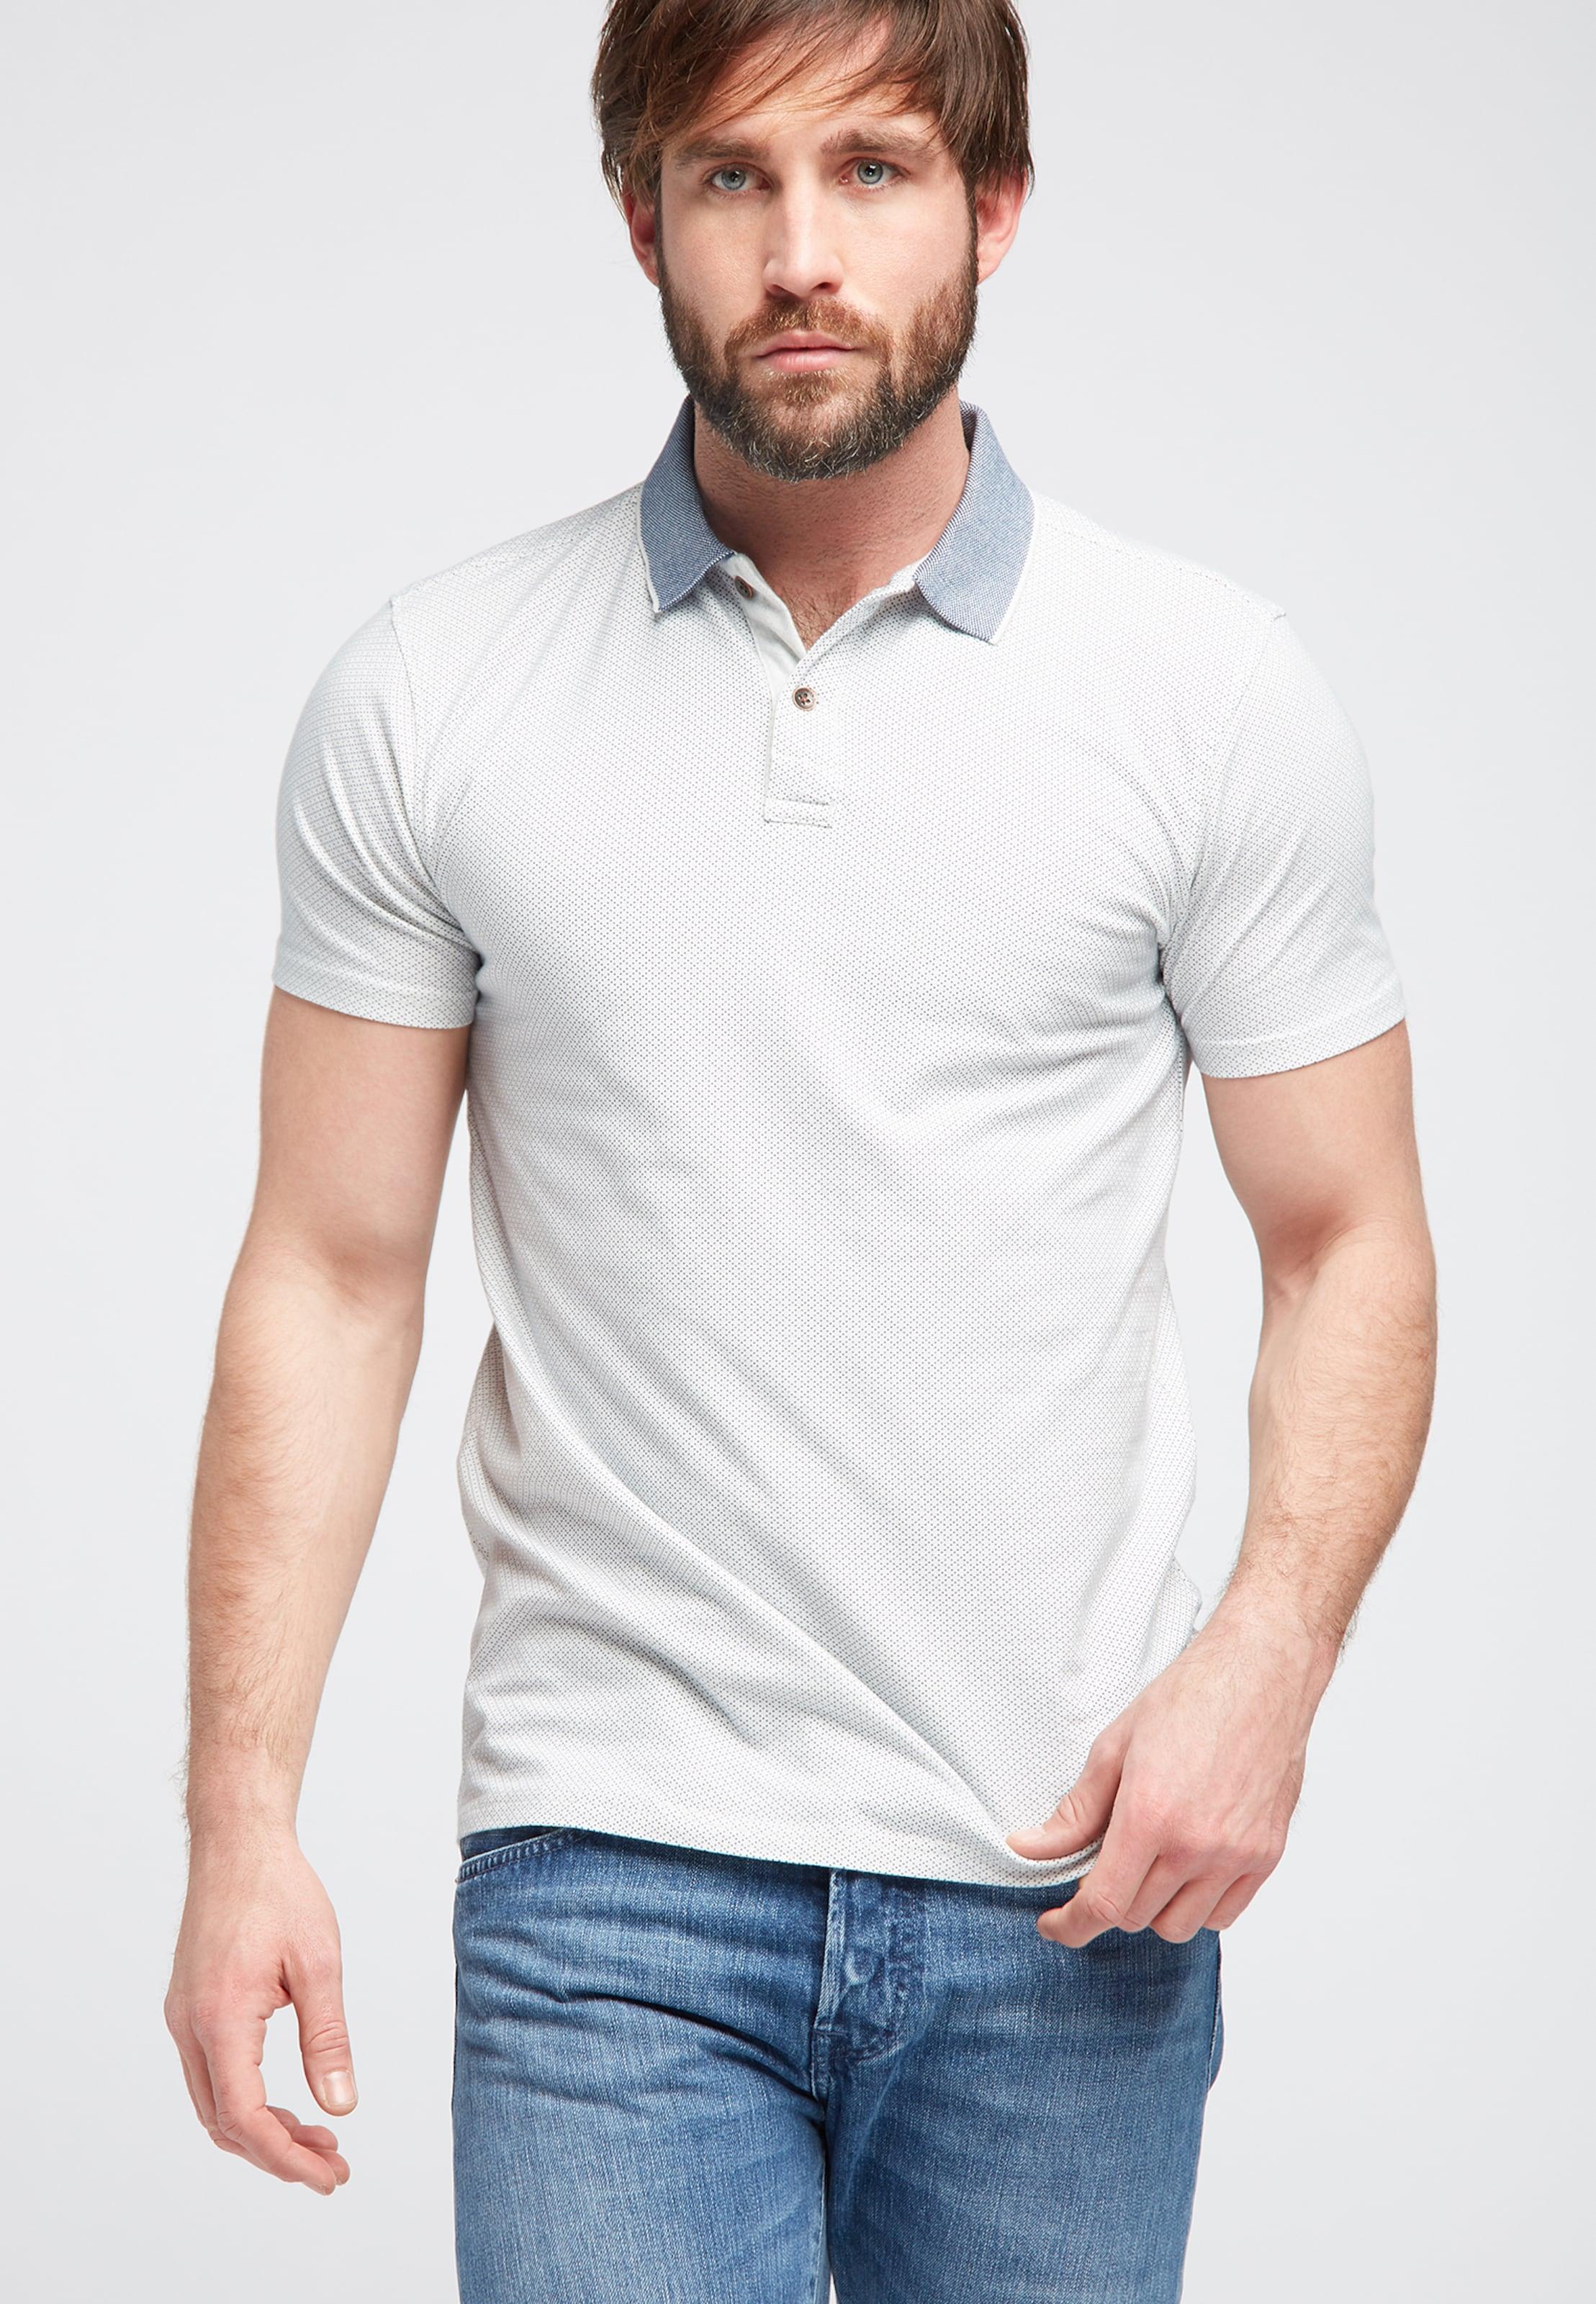 Shirt Shirt Industries Offwhite Petrol Petrol Petrol In Shirt Offwhite Industries In Industries 7bYf6gyv